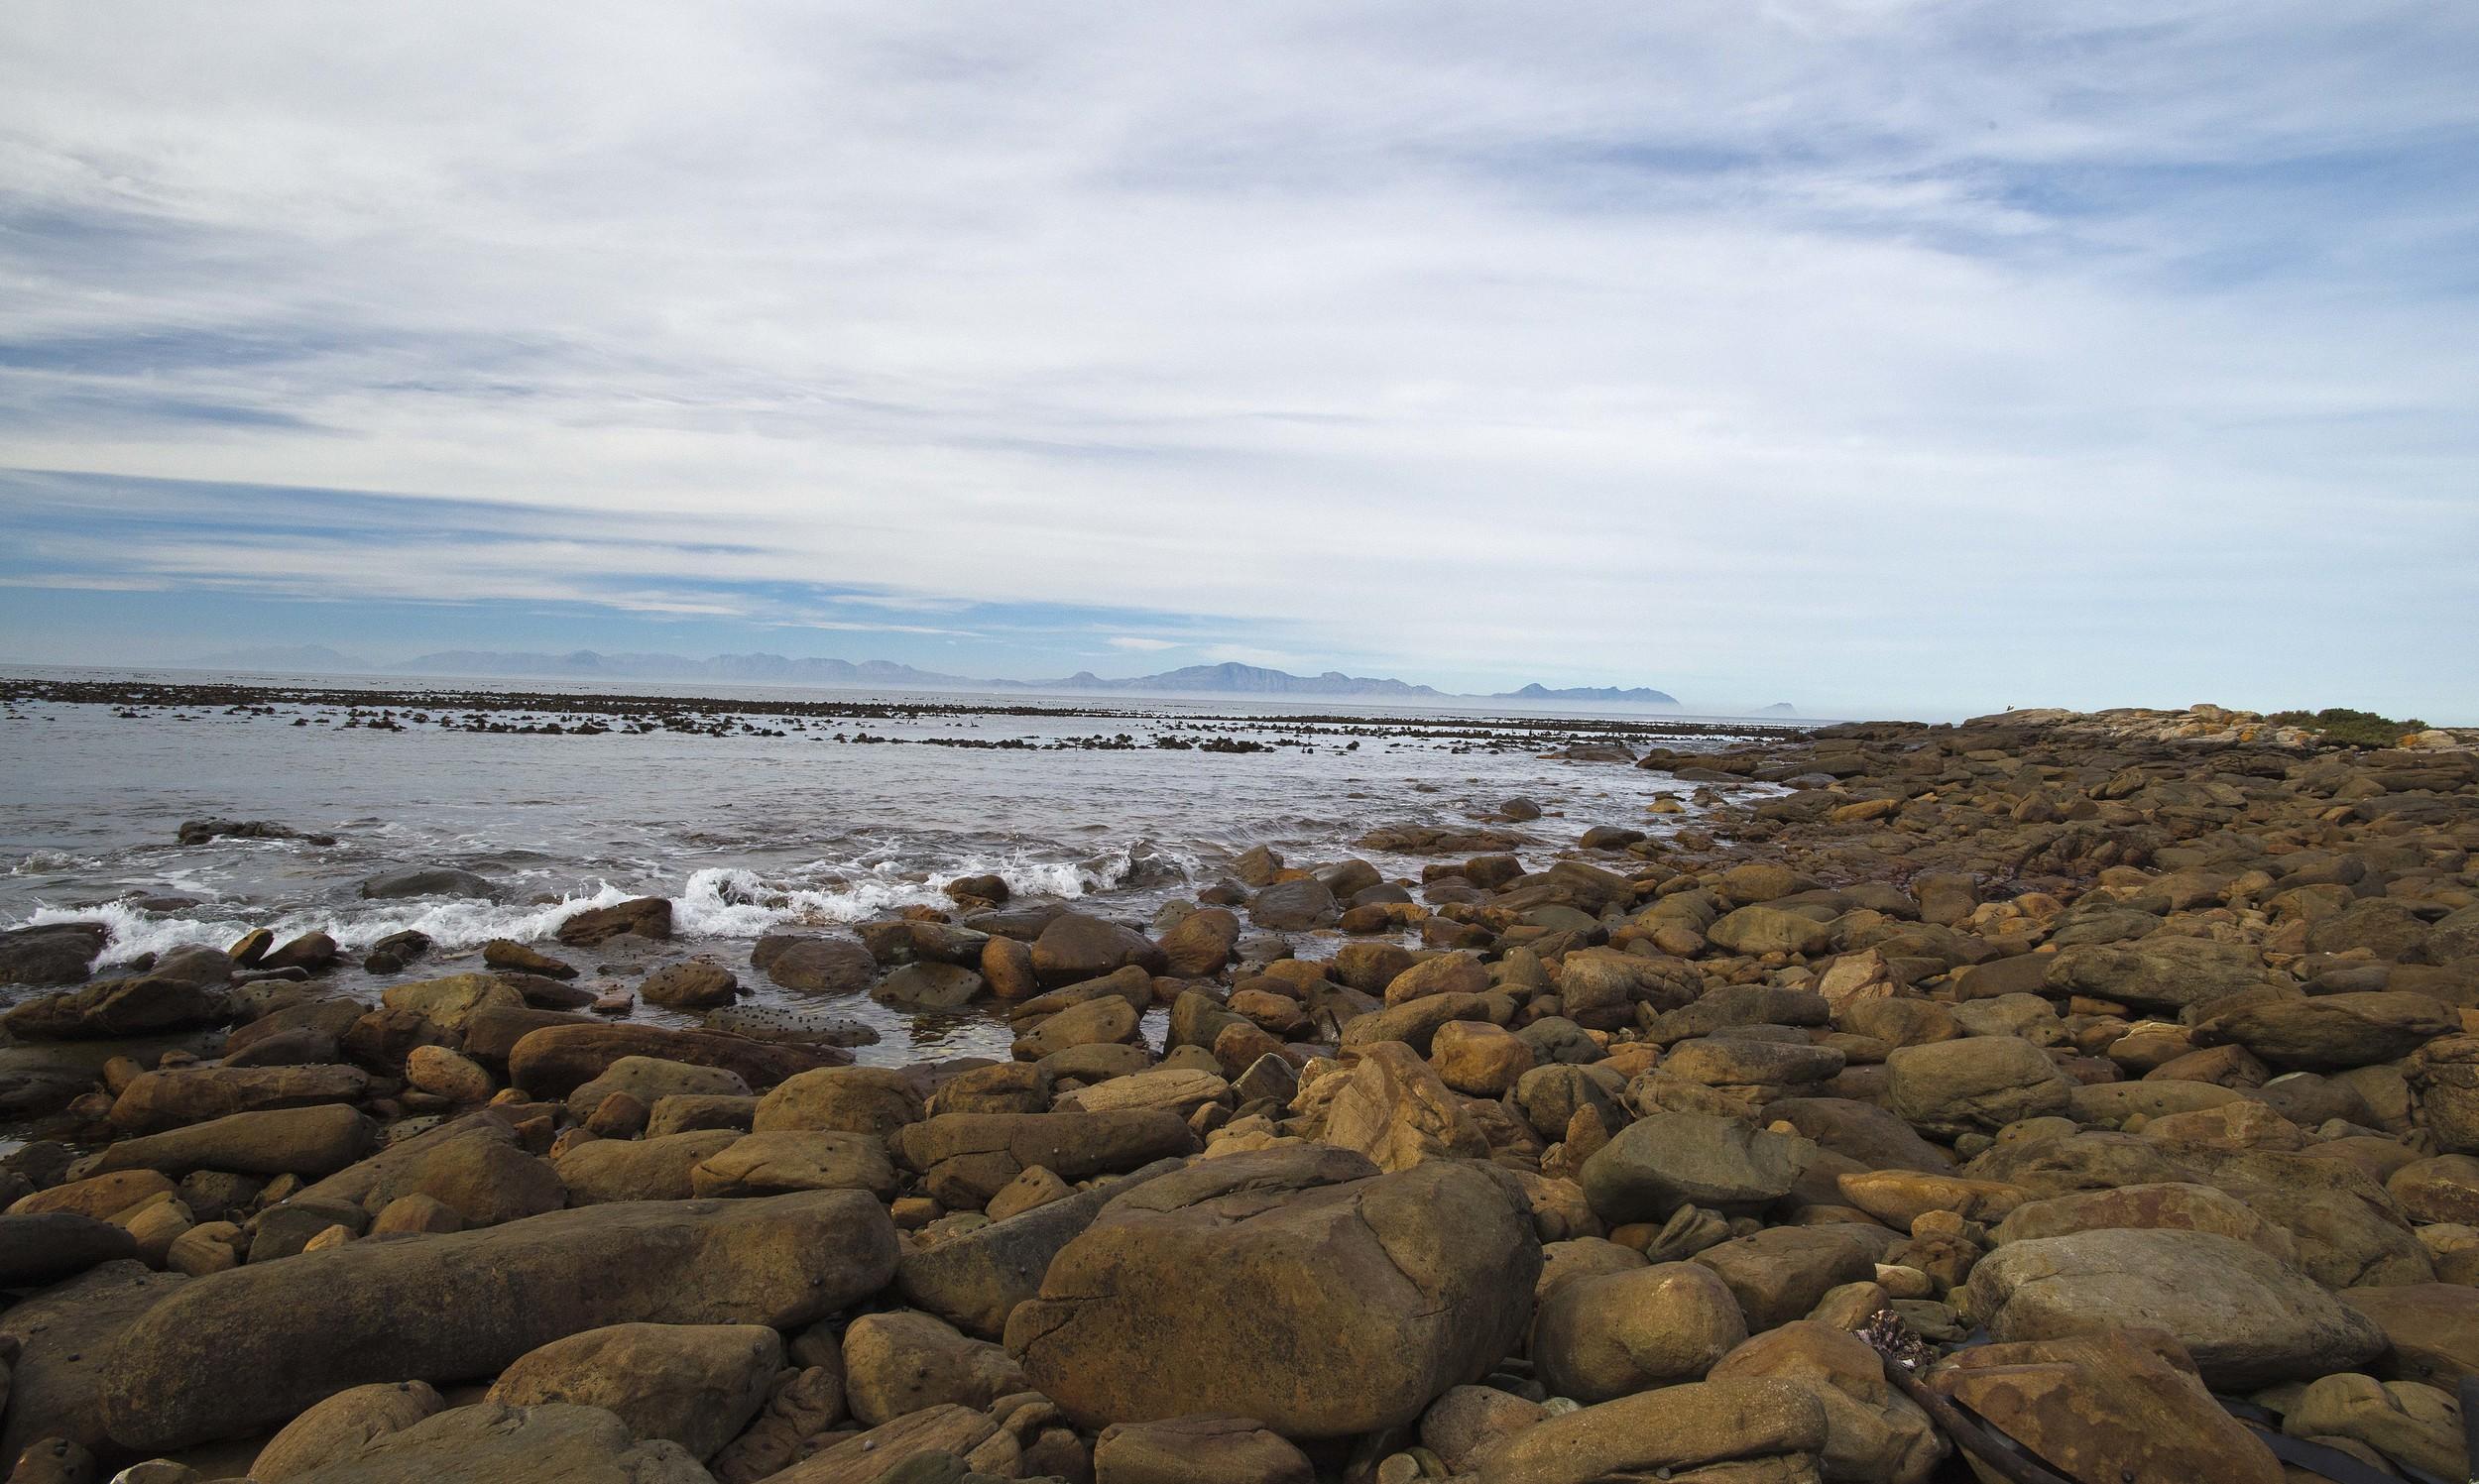 130420_DSC2813 Cape Point - Cape of Good Hope.jpg